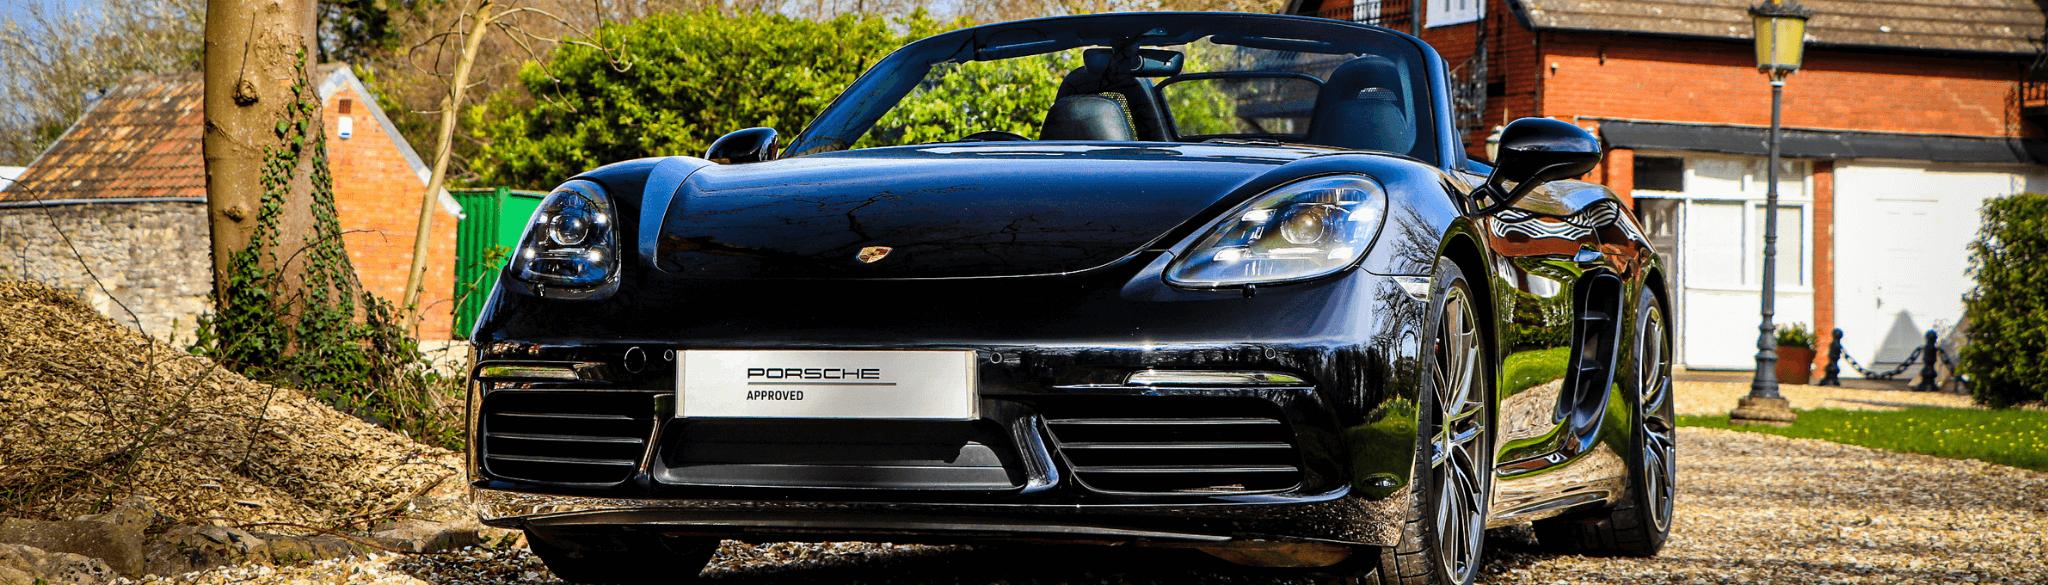 Porsche 718 Boxster For Sale (1)